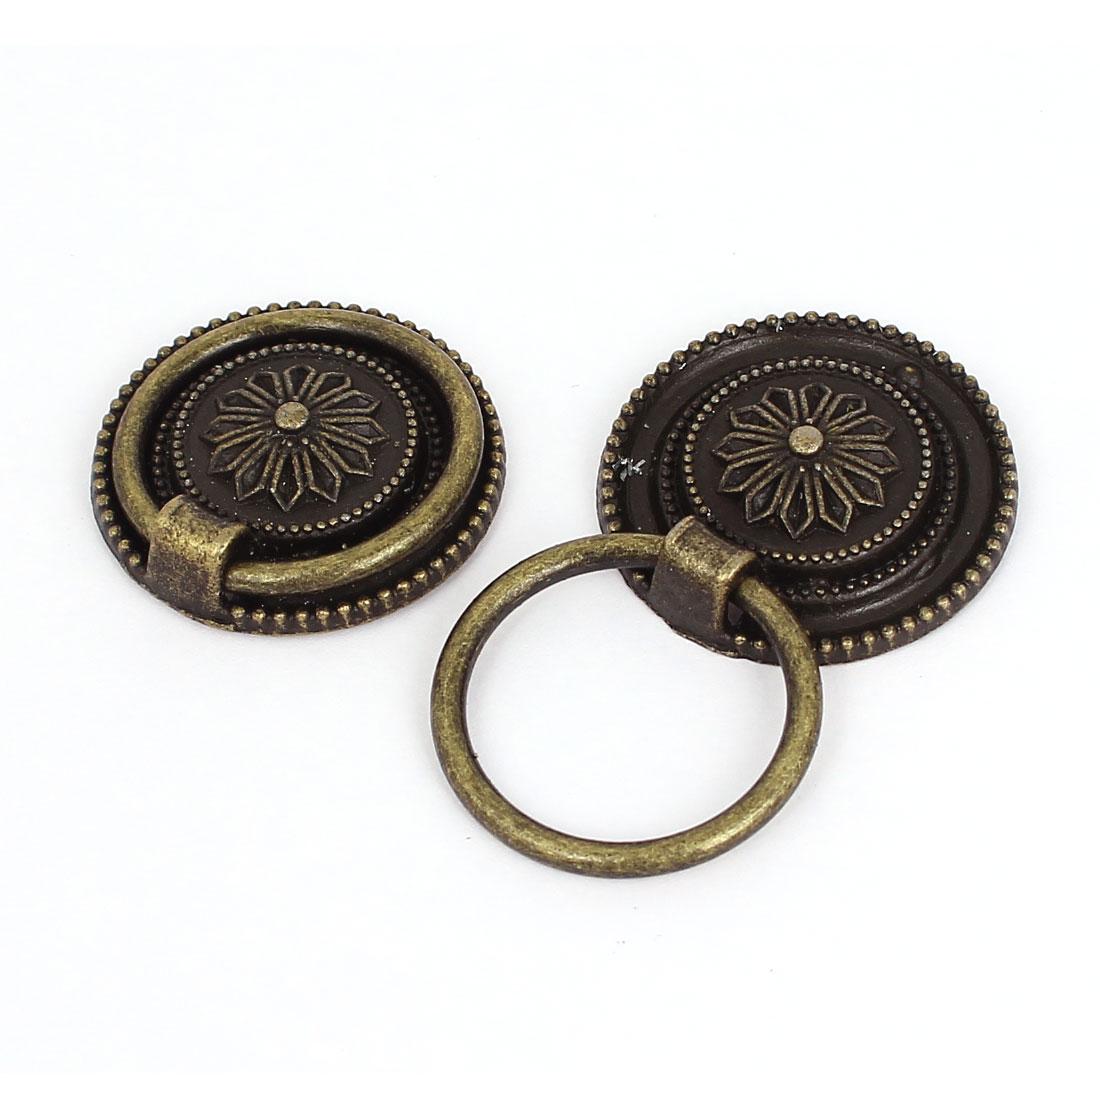 2Pcs Cabinet Drawer Door Metal Round Pull Handles Bronze Tone 3cm Dia